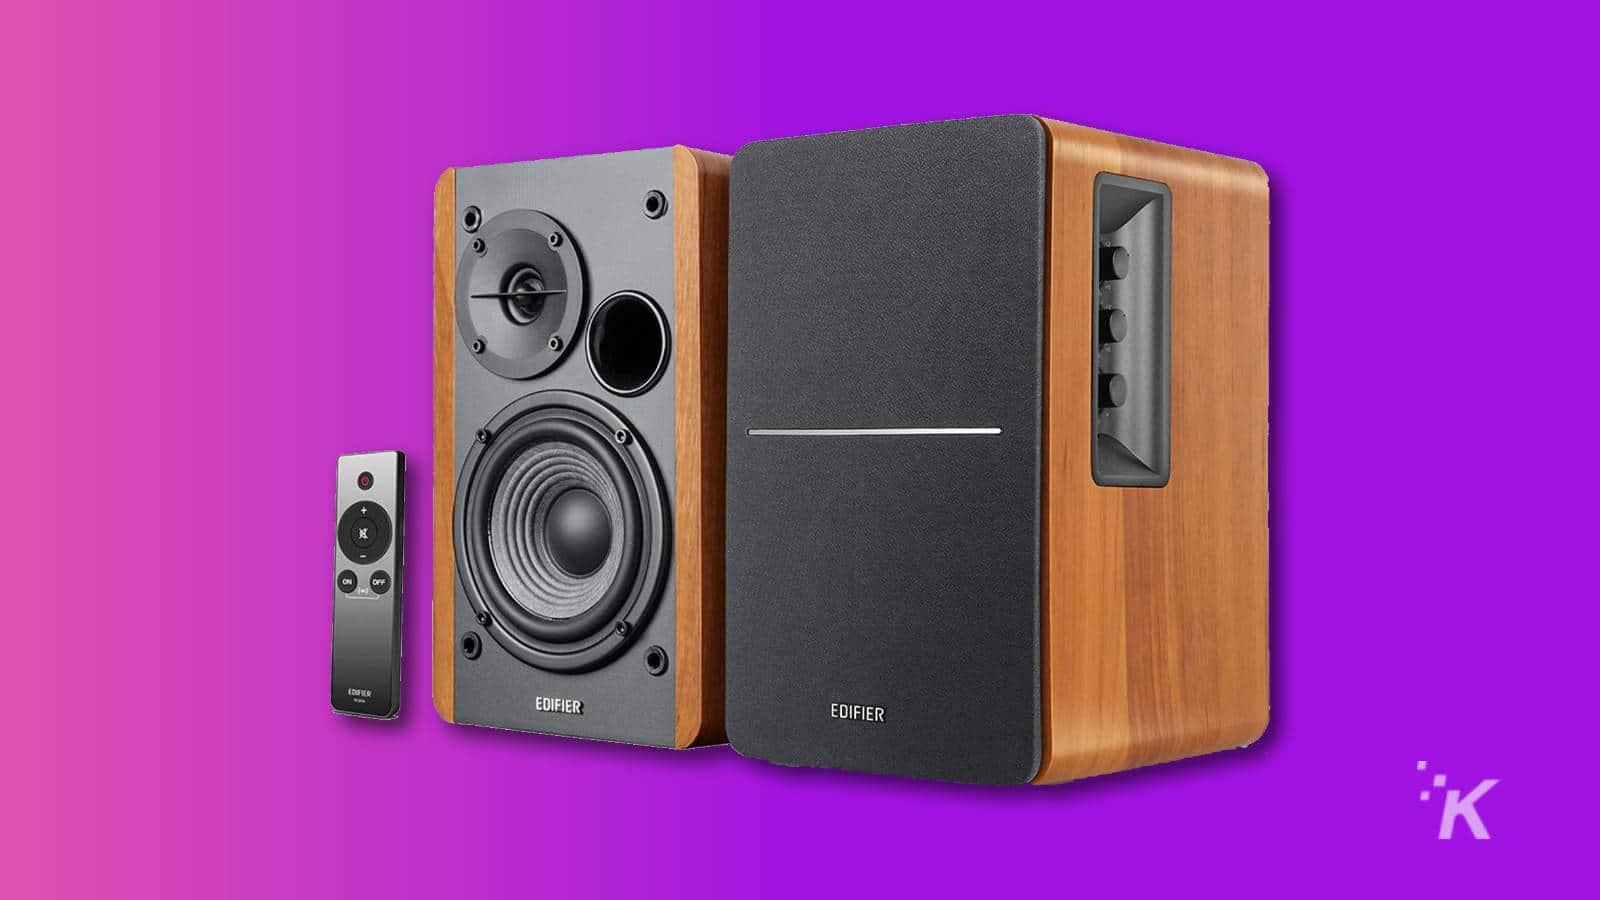 Edifier R1280Ts Powered Bookshelf Speakers